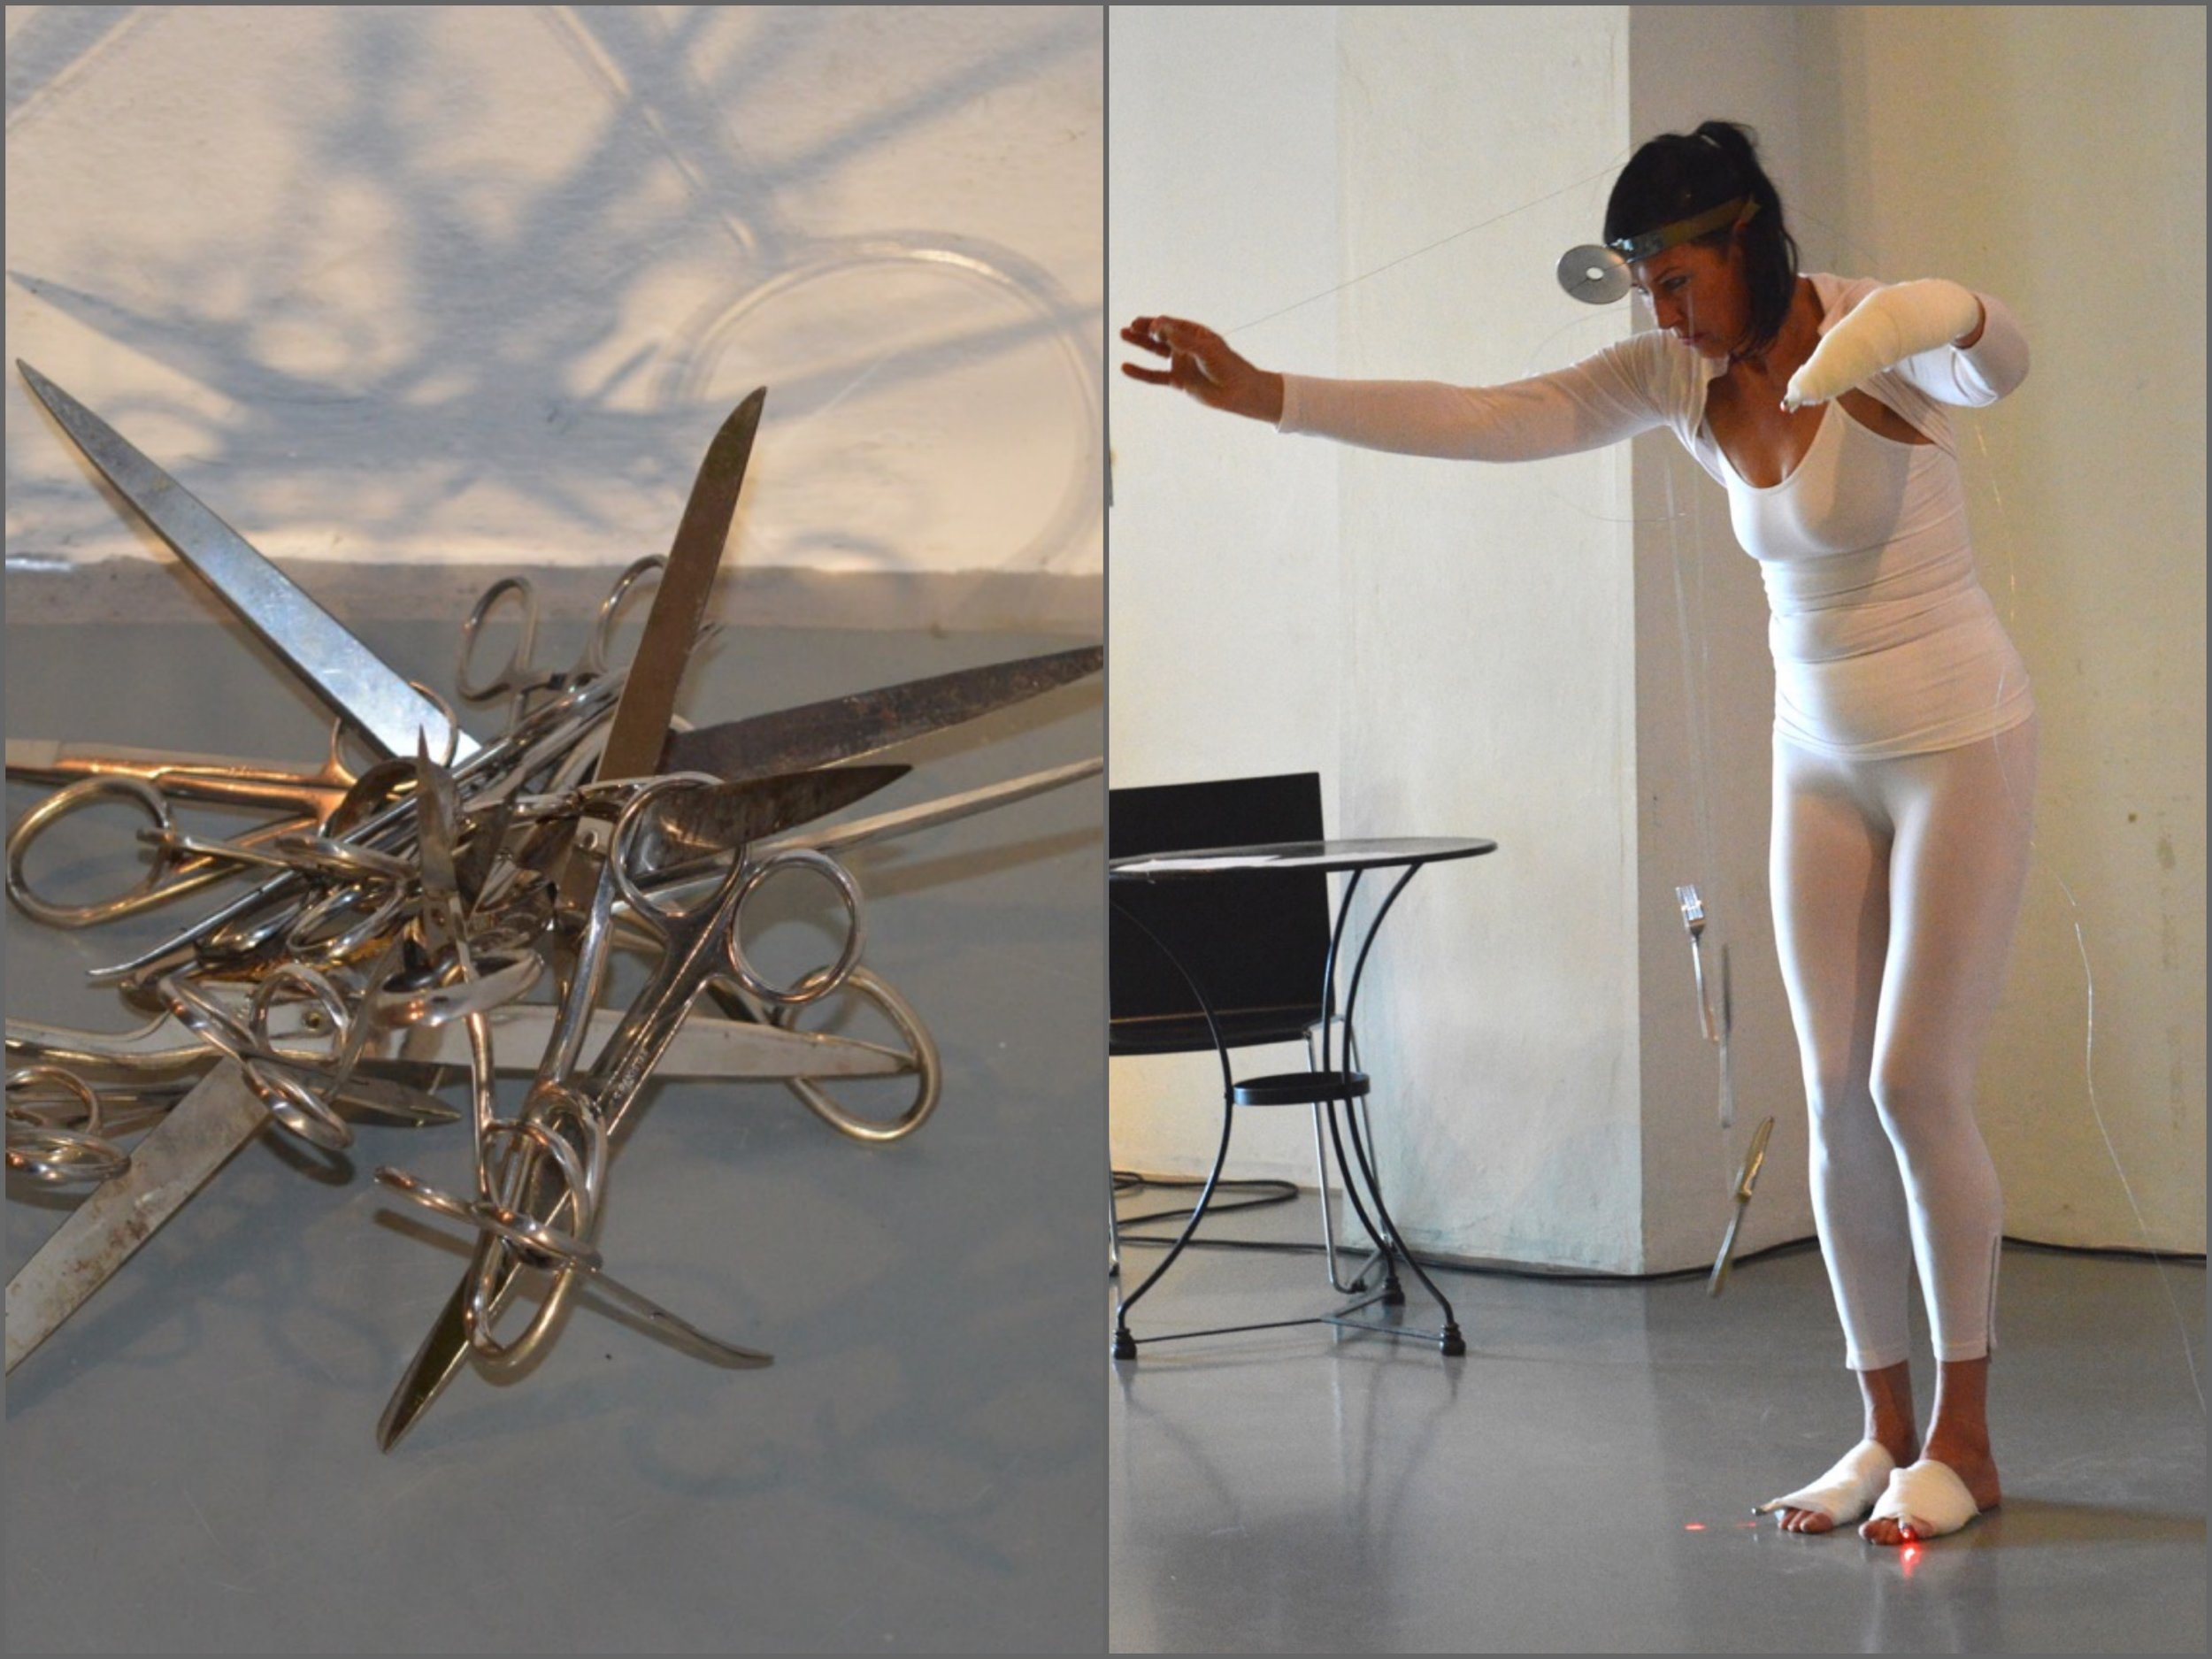 (excerpt)  Messer, Schere, Gabel, Licht   ,  Eru and Seven of Eglise (Alexander Rues and Dagmar I. Glausnitzer-Smith),  Live Performance and Sound Experimentation,         Open Art 2016 Freiburg,  photographed by    Monika Hagen